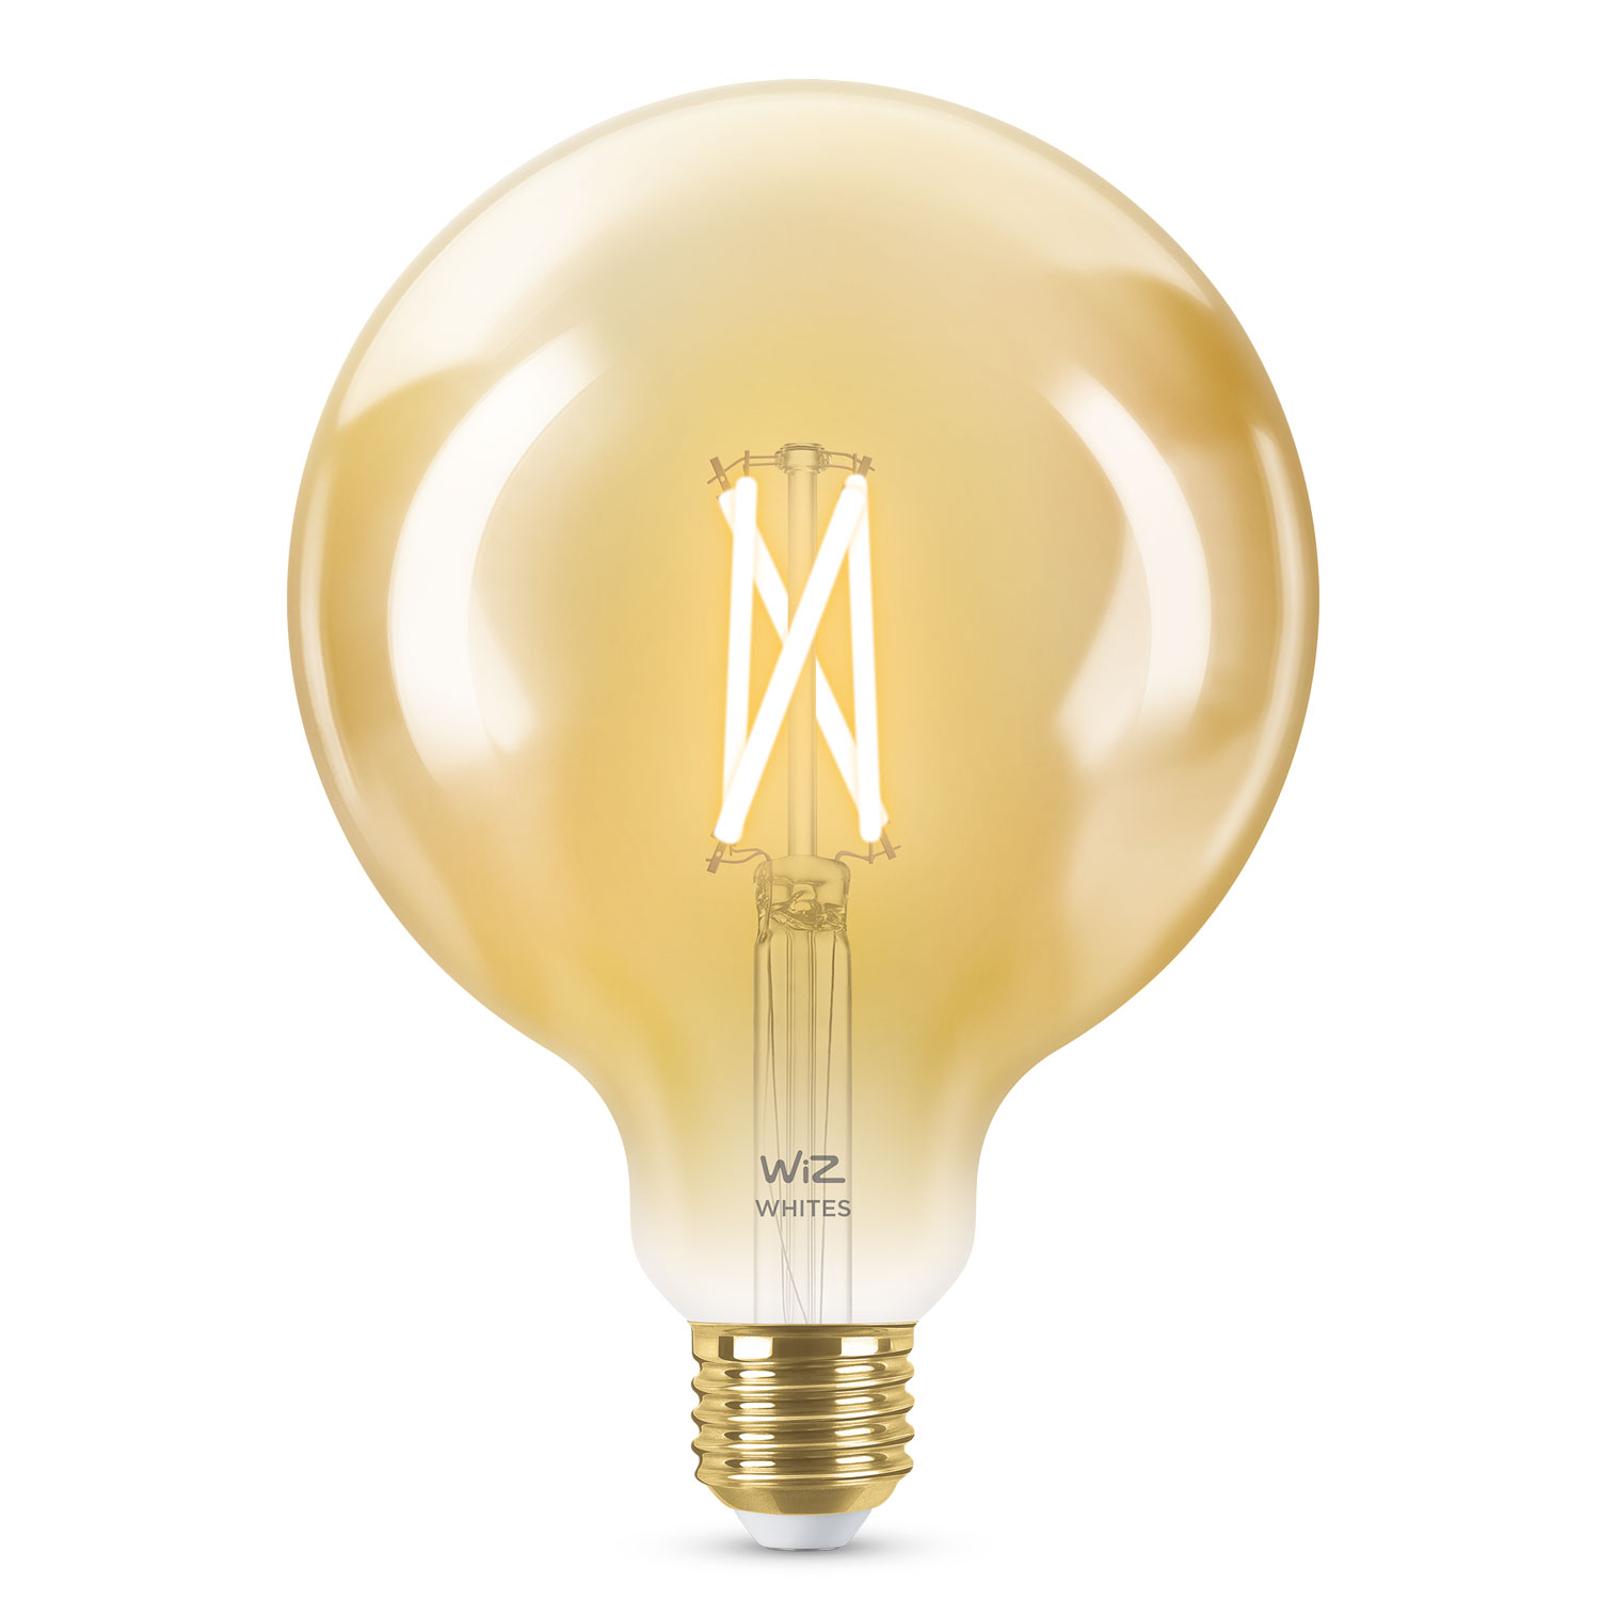 WiZ E27 LED G125 Filament amber 6,5W 2.000-4.500K